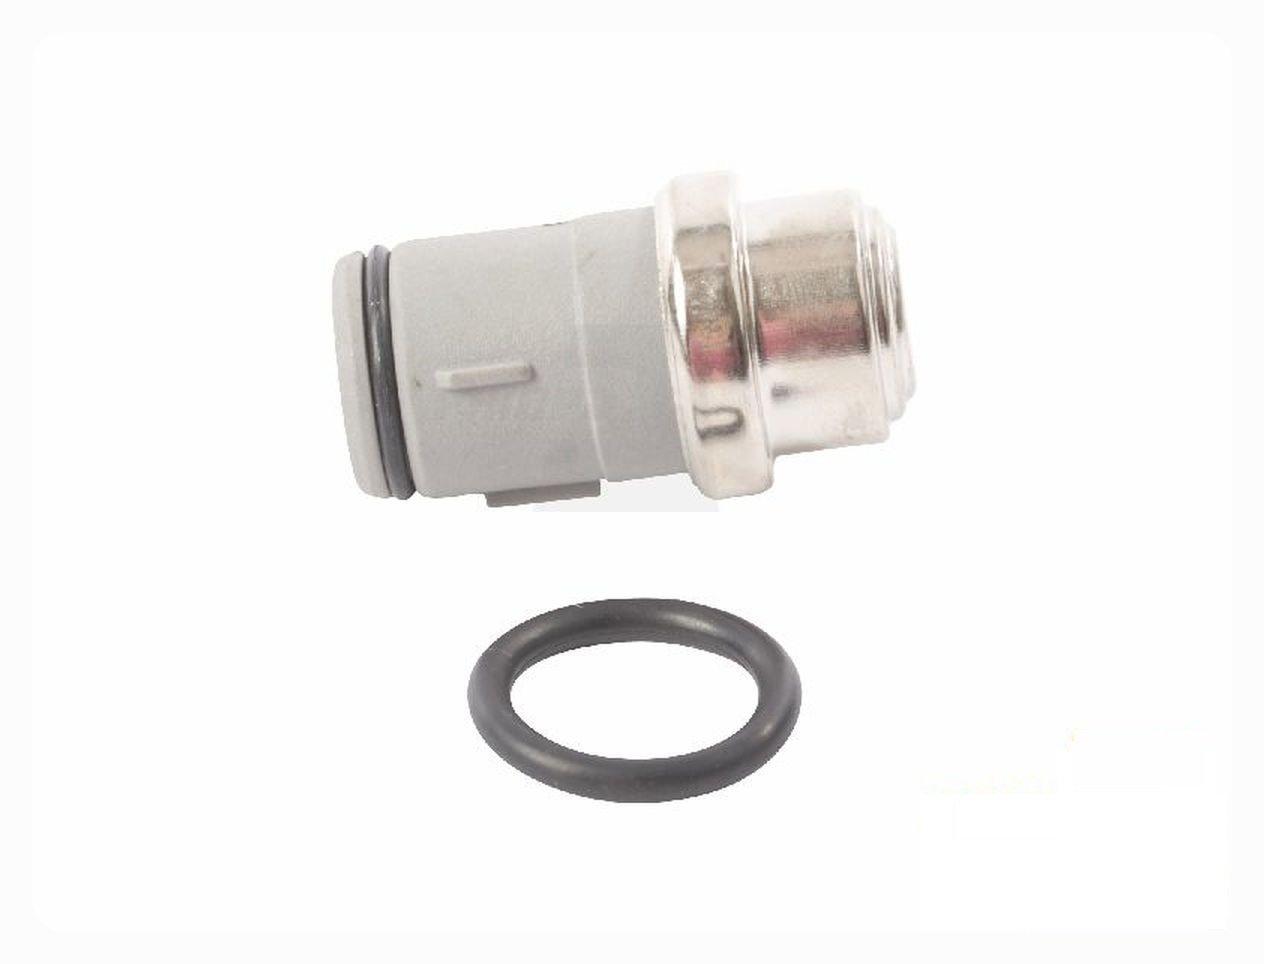 PRIOPA Kü hlmitteltemperatur-Sensor mit Dichtung - A896826 R.O.D. Leichtmetallräder Priopa